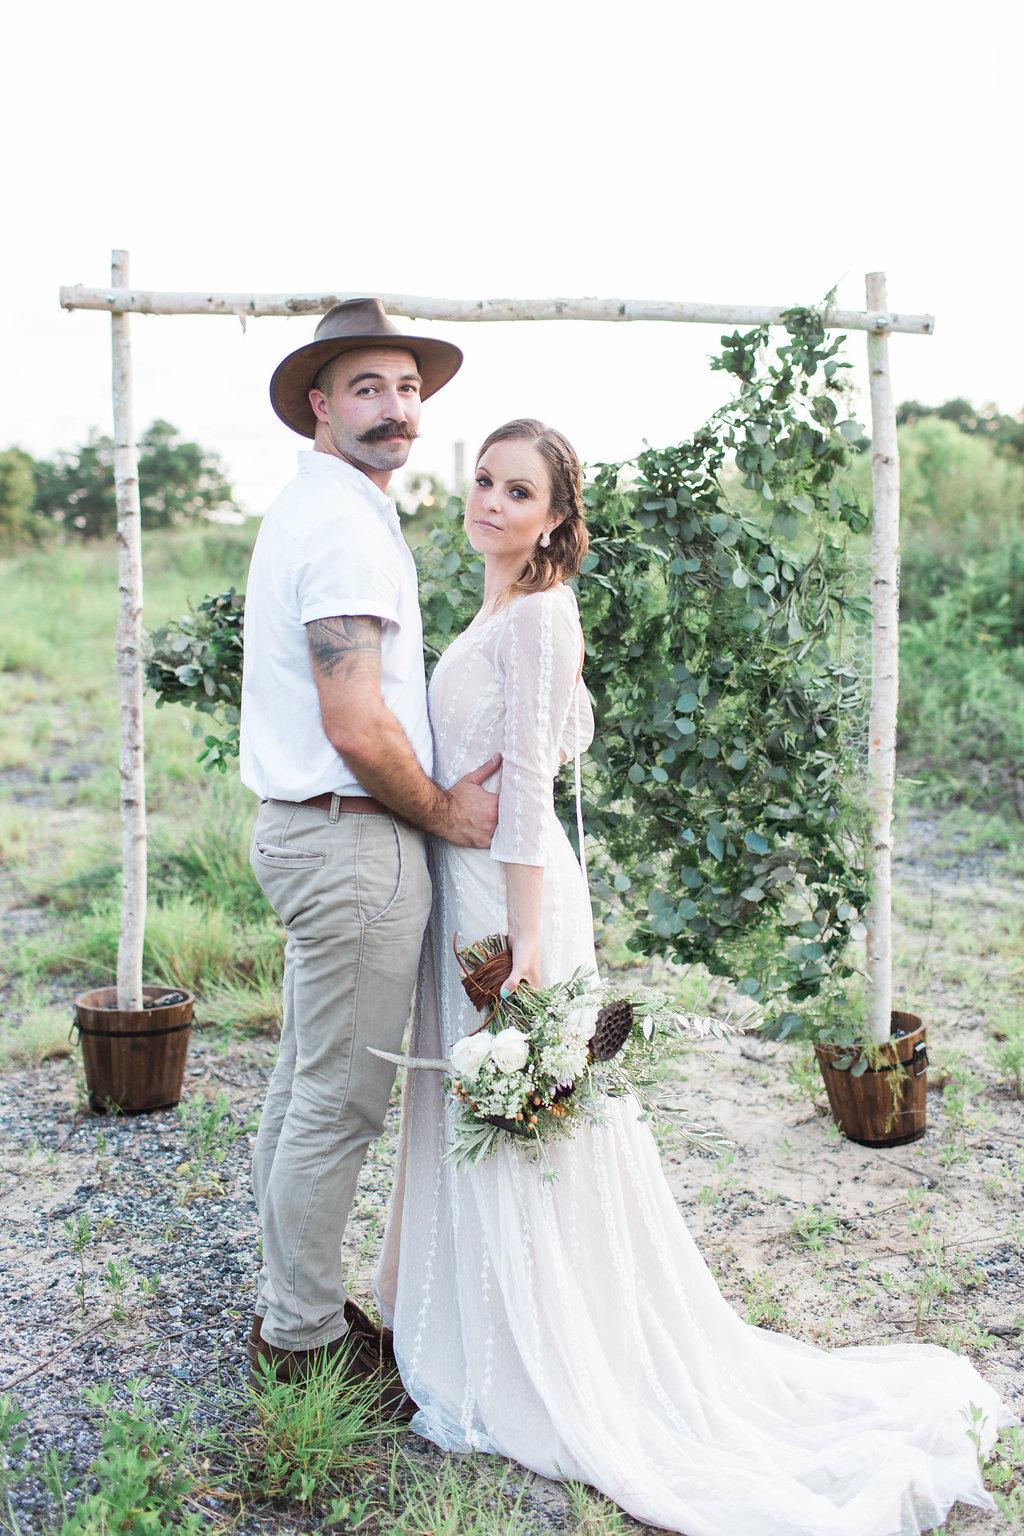 apt-b-photography-ivory-and-beau-bridal-boutique-anna-campbell-isobelle-australian-wedding-the-collins-quarter-savannah-wedding-savannah-weddings-savannah-florist-savannah-bridal-savannah-event-designer-savannah-wedding-dresses-outback-wedding-38.jpg